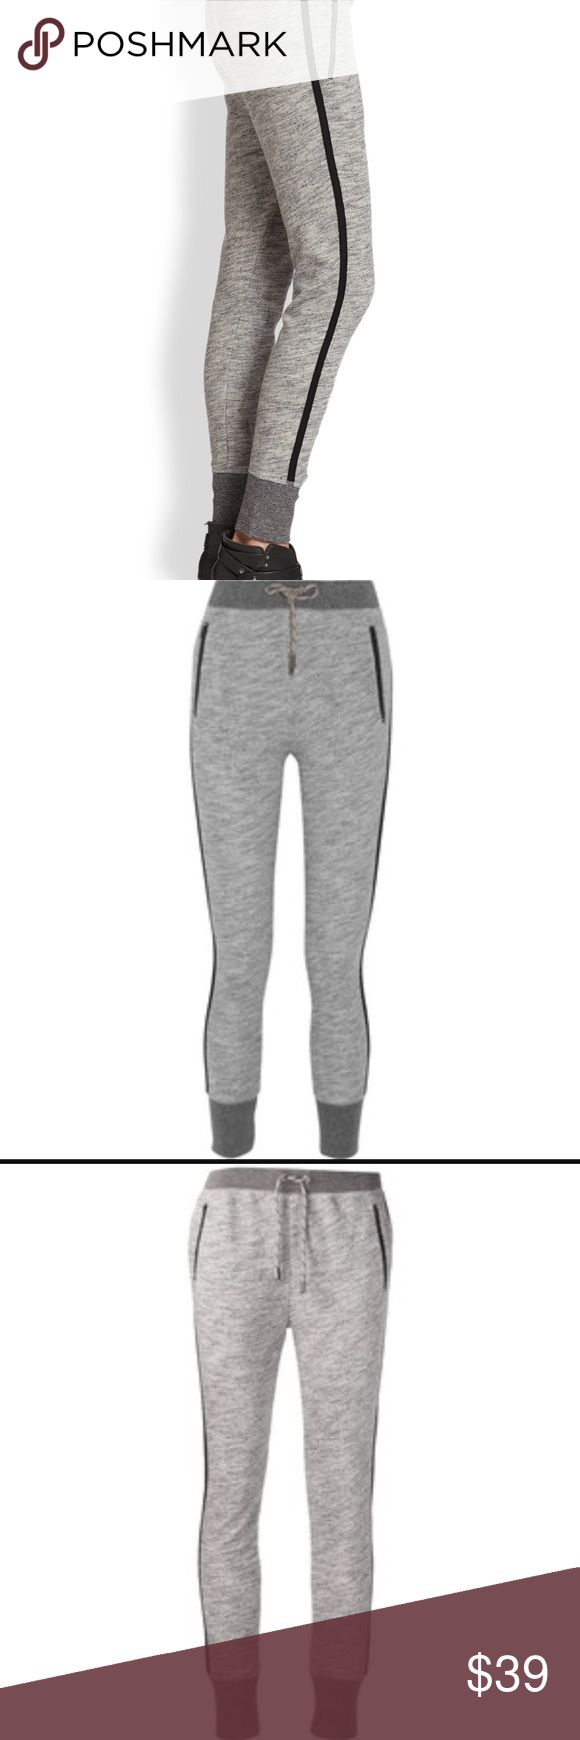 Rag and bone gray and black harem sweatpants Rag and bone size medium grey sweats with black side stripe and size zip pockets. Tie at waist. rag & bone Pants